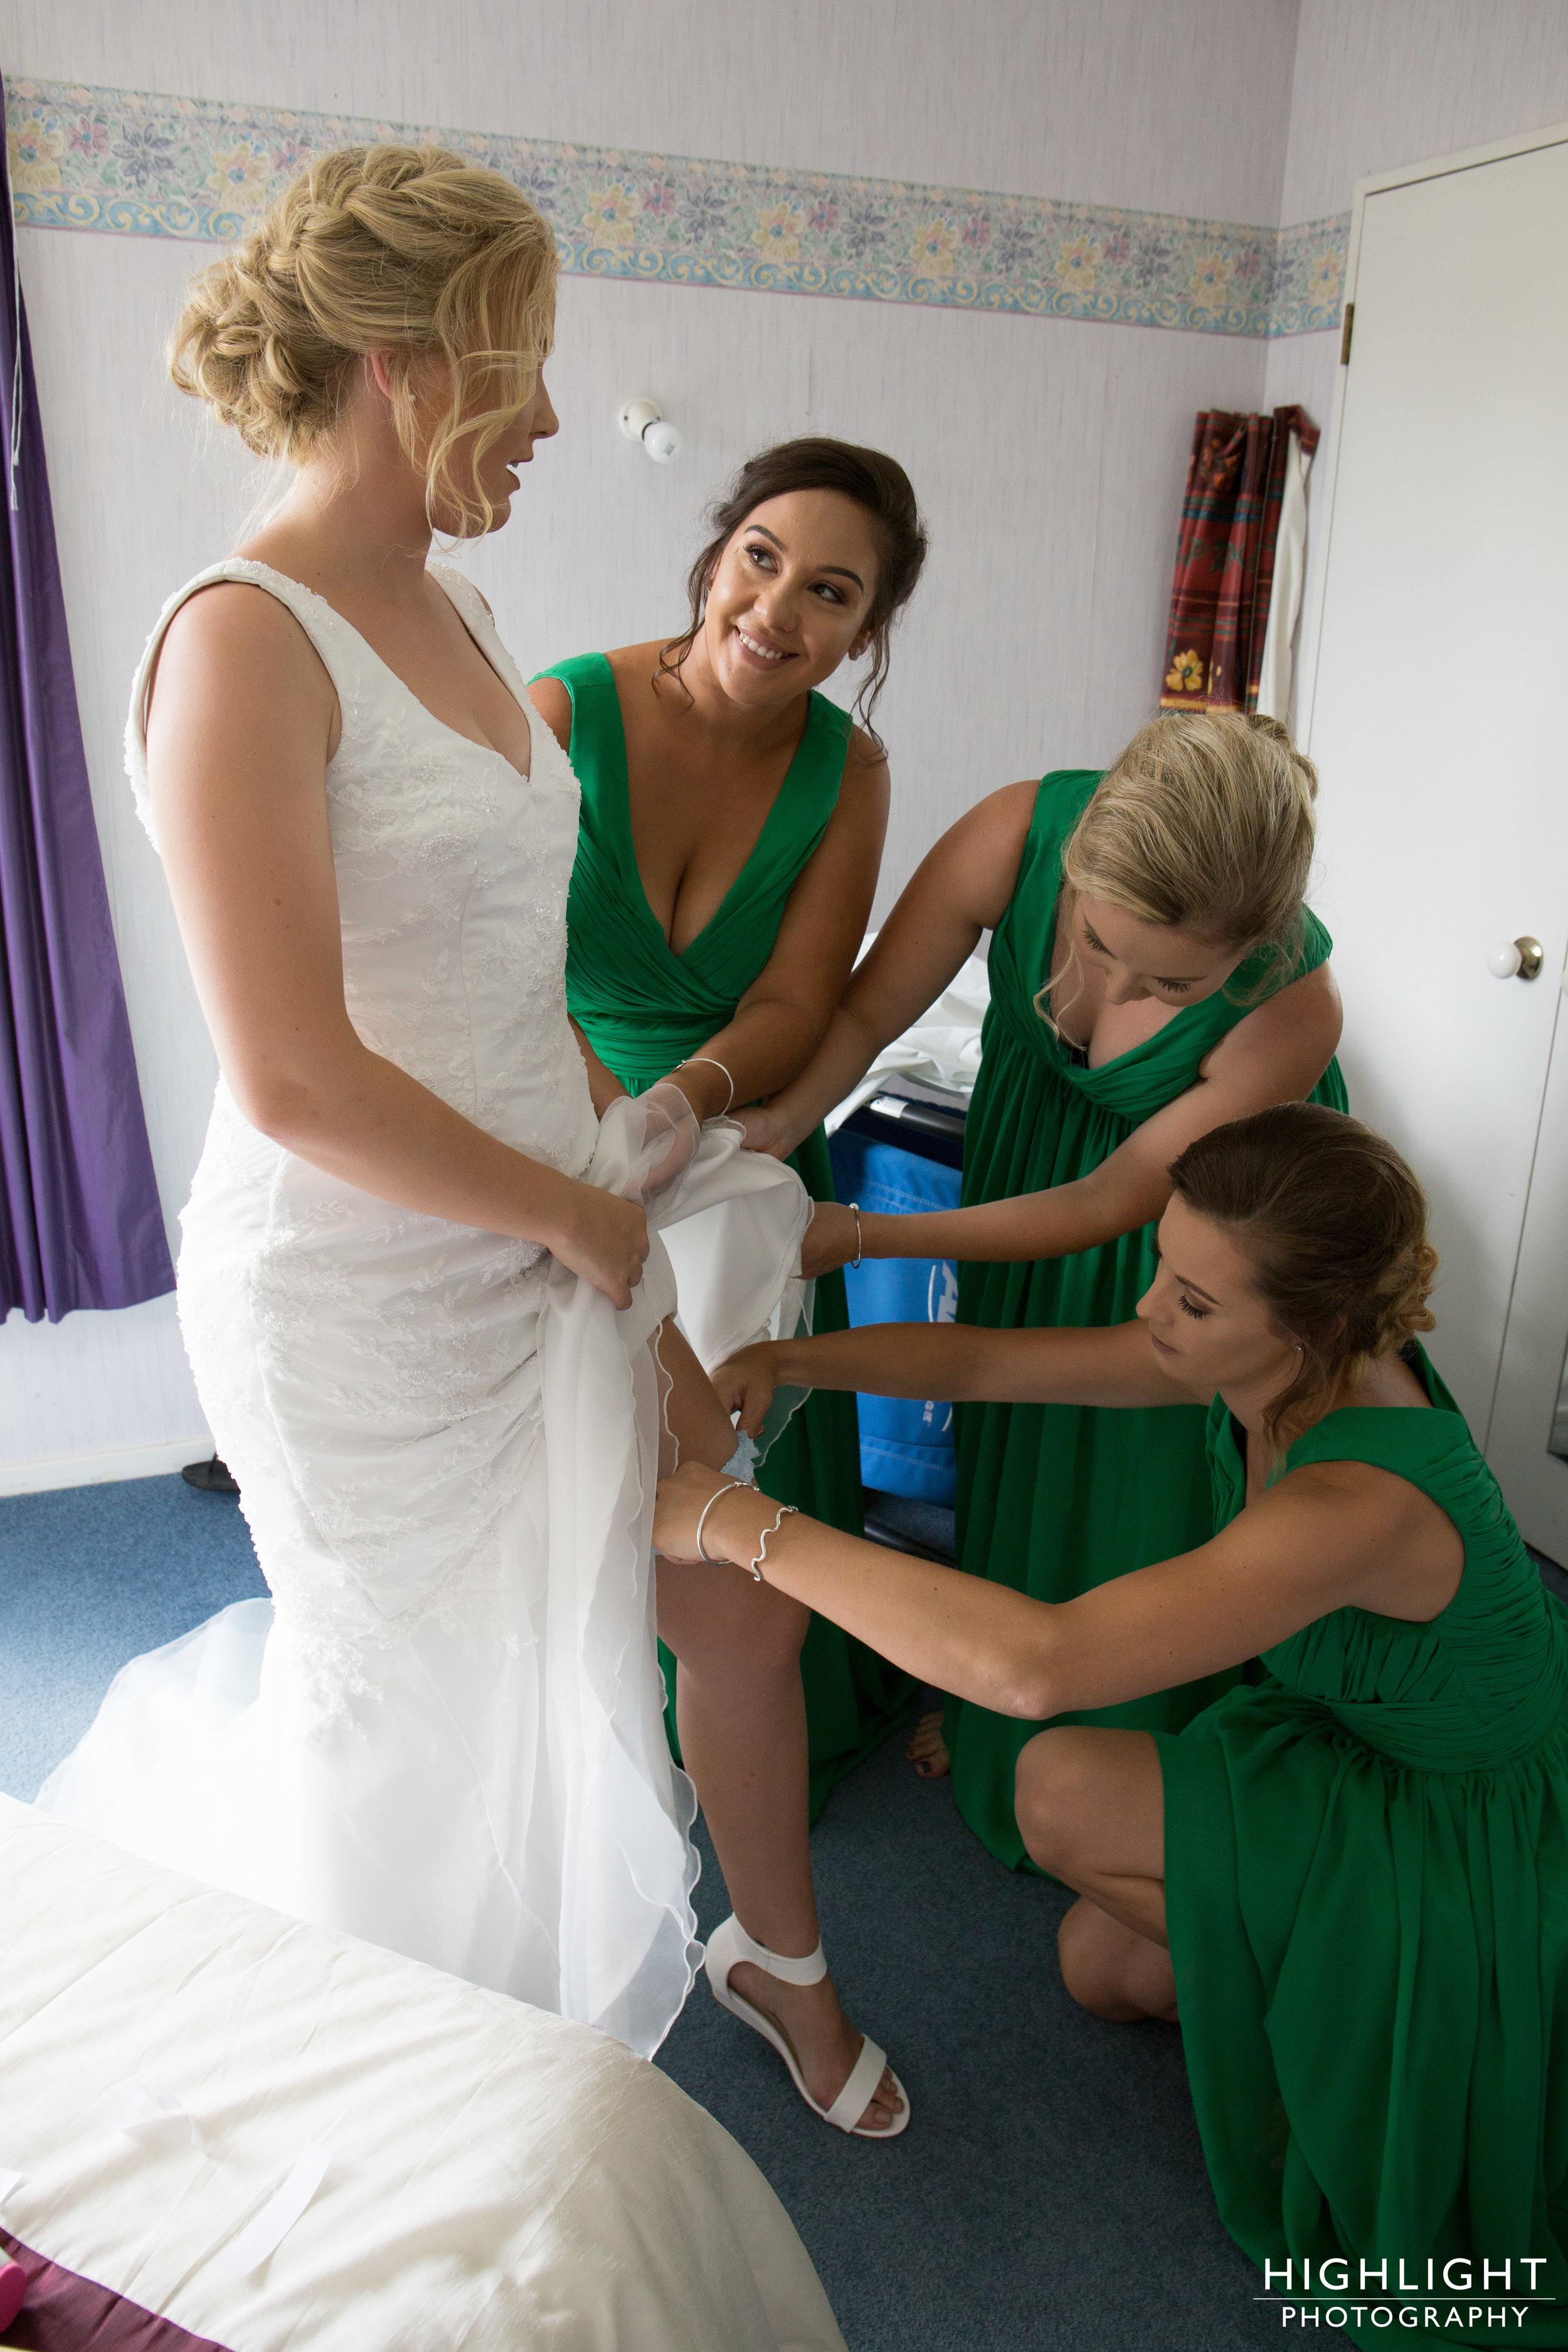 highlight-wedding-photography-palmerston-north-new-zealand